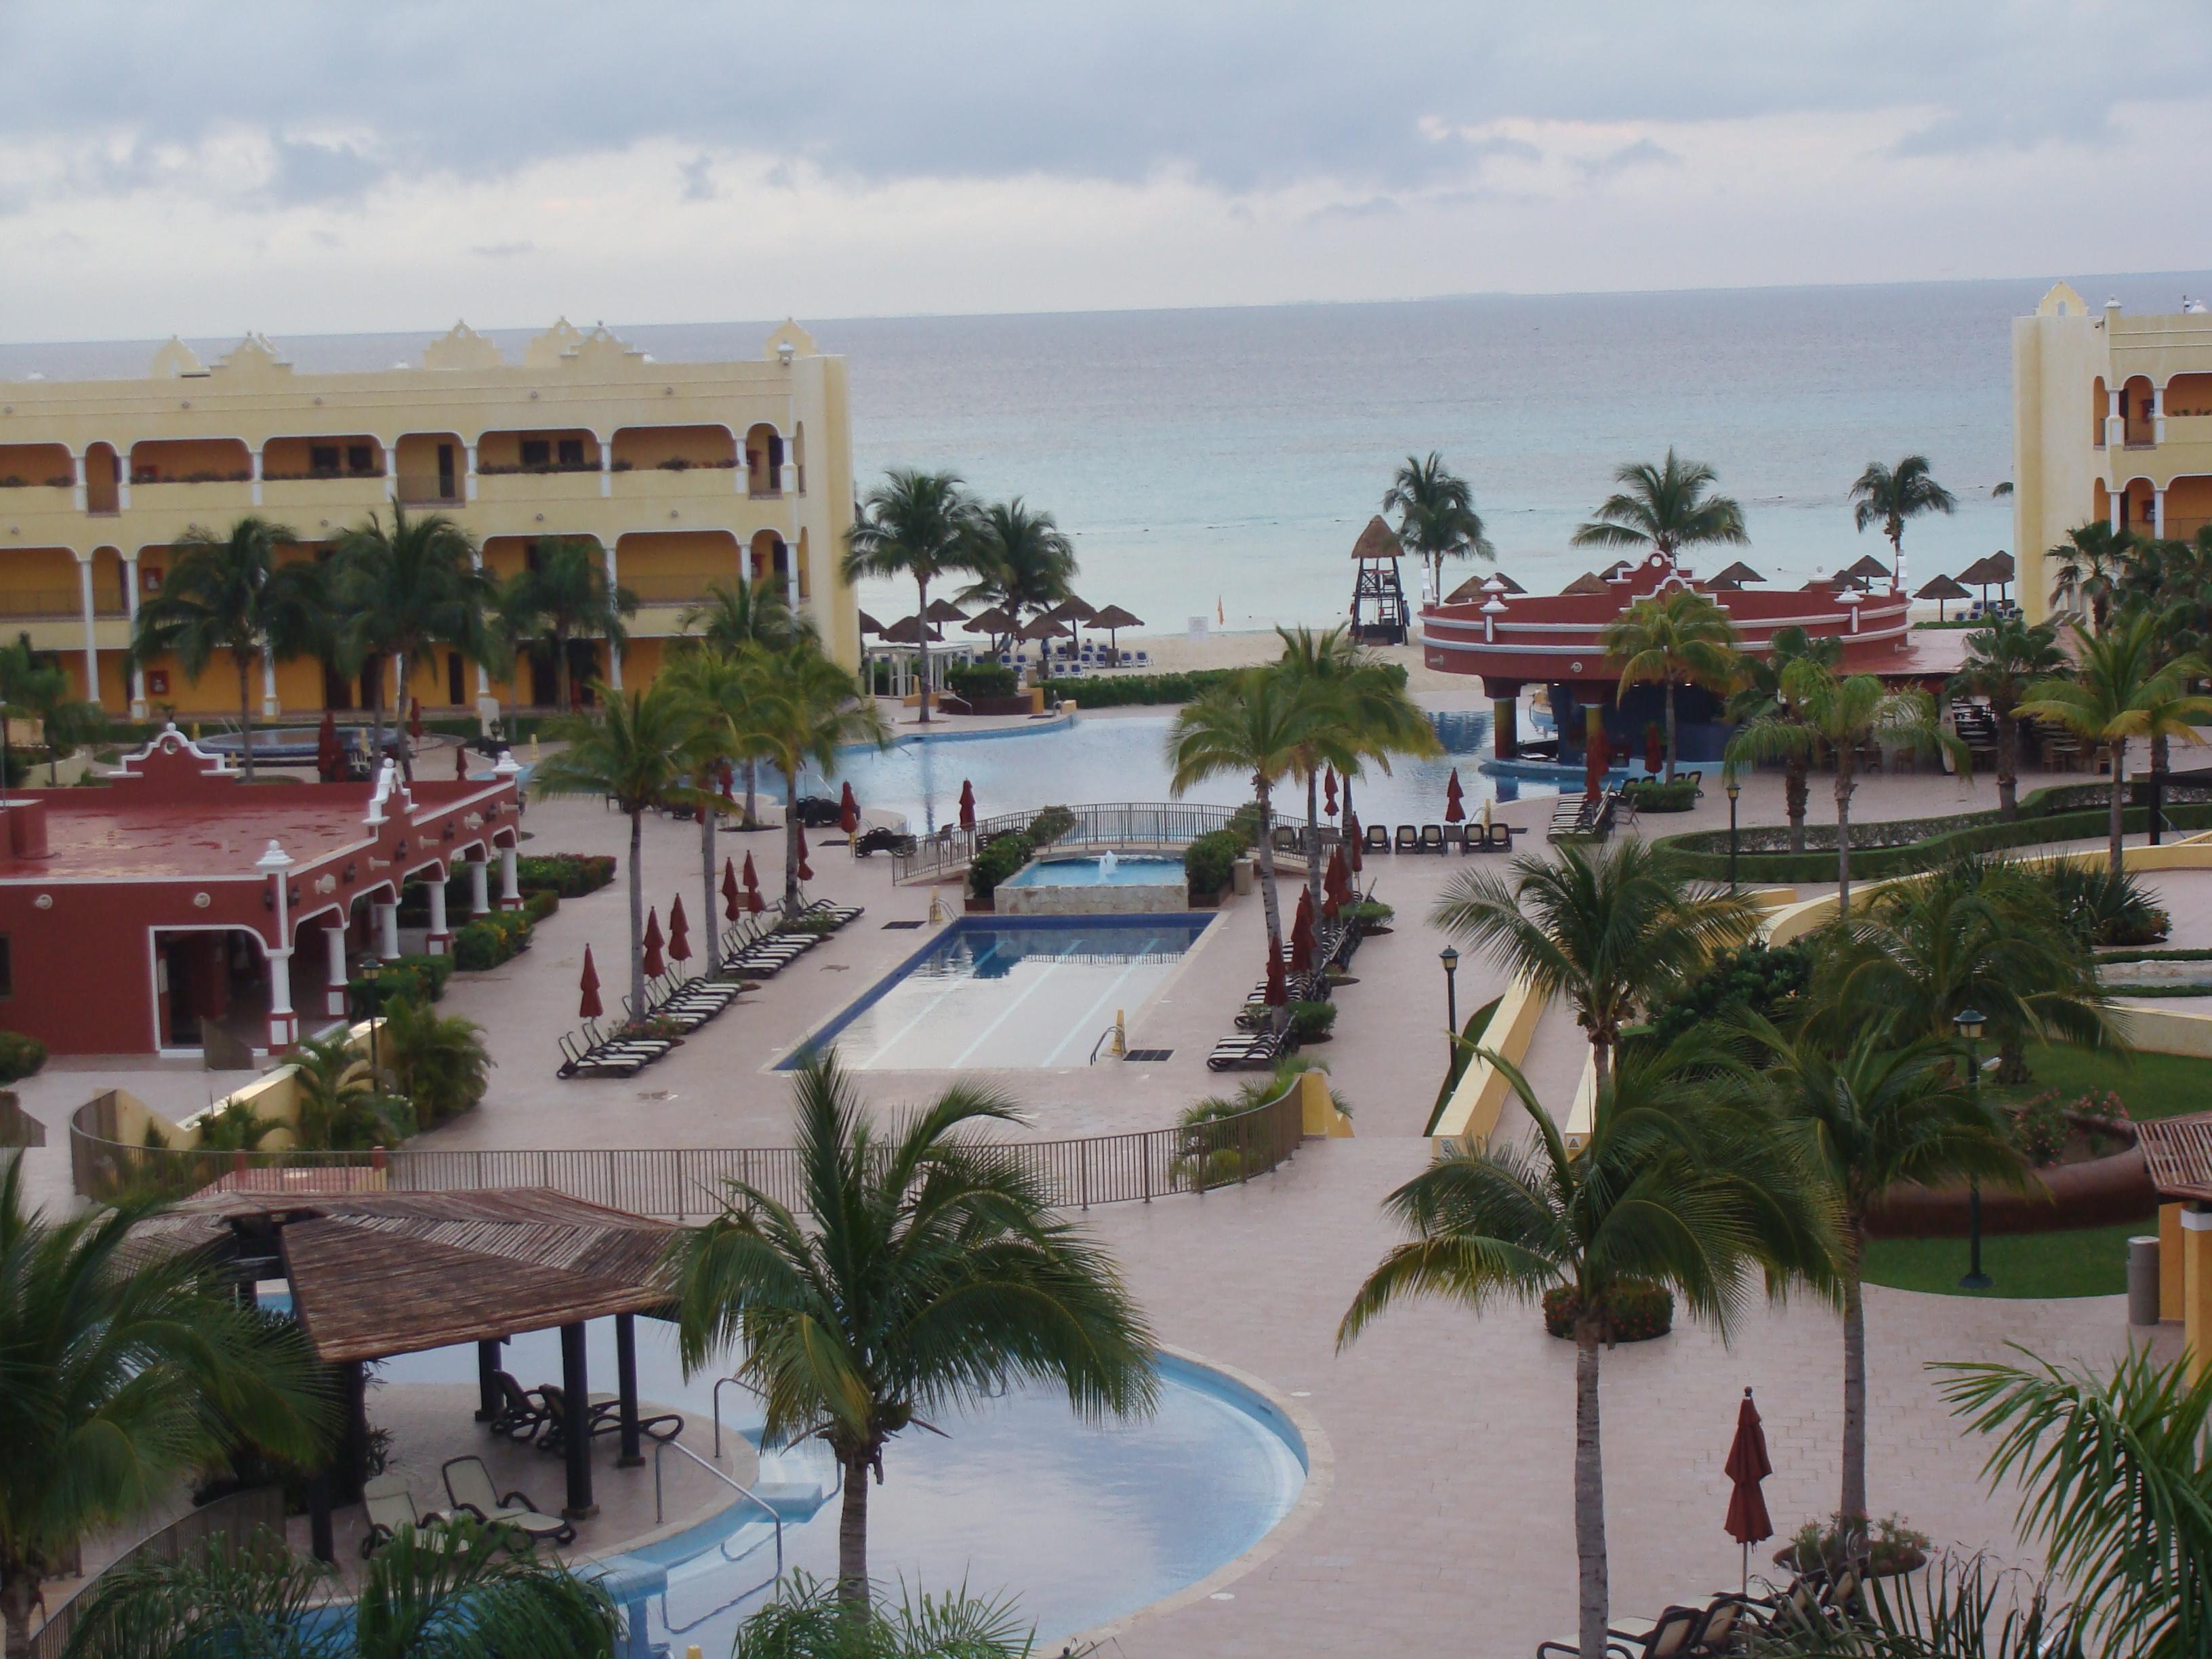 The Royal Haciendas image